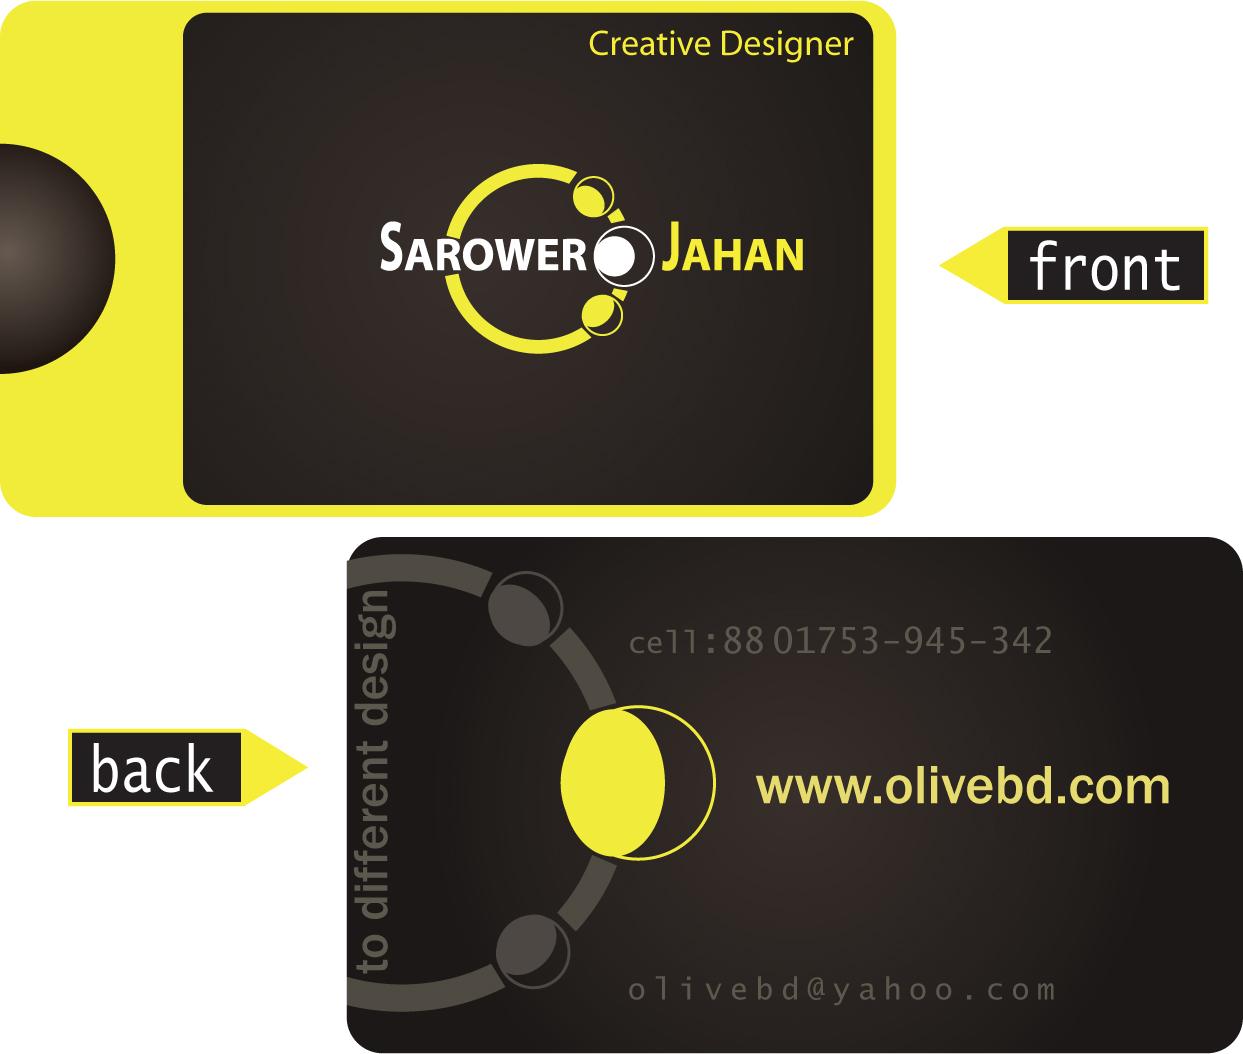 Visiting Card Background Design Sample | psdtemp.net